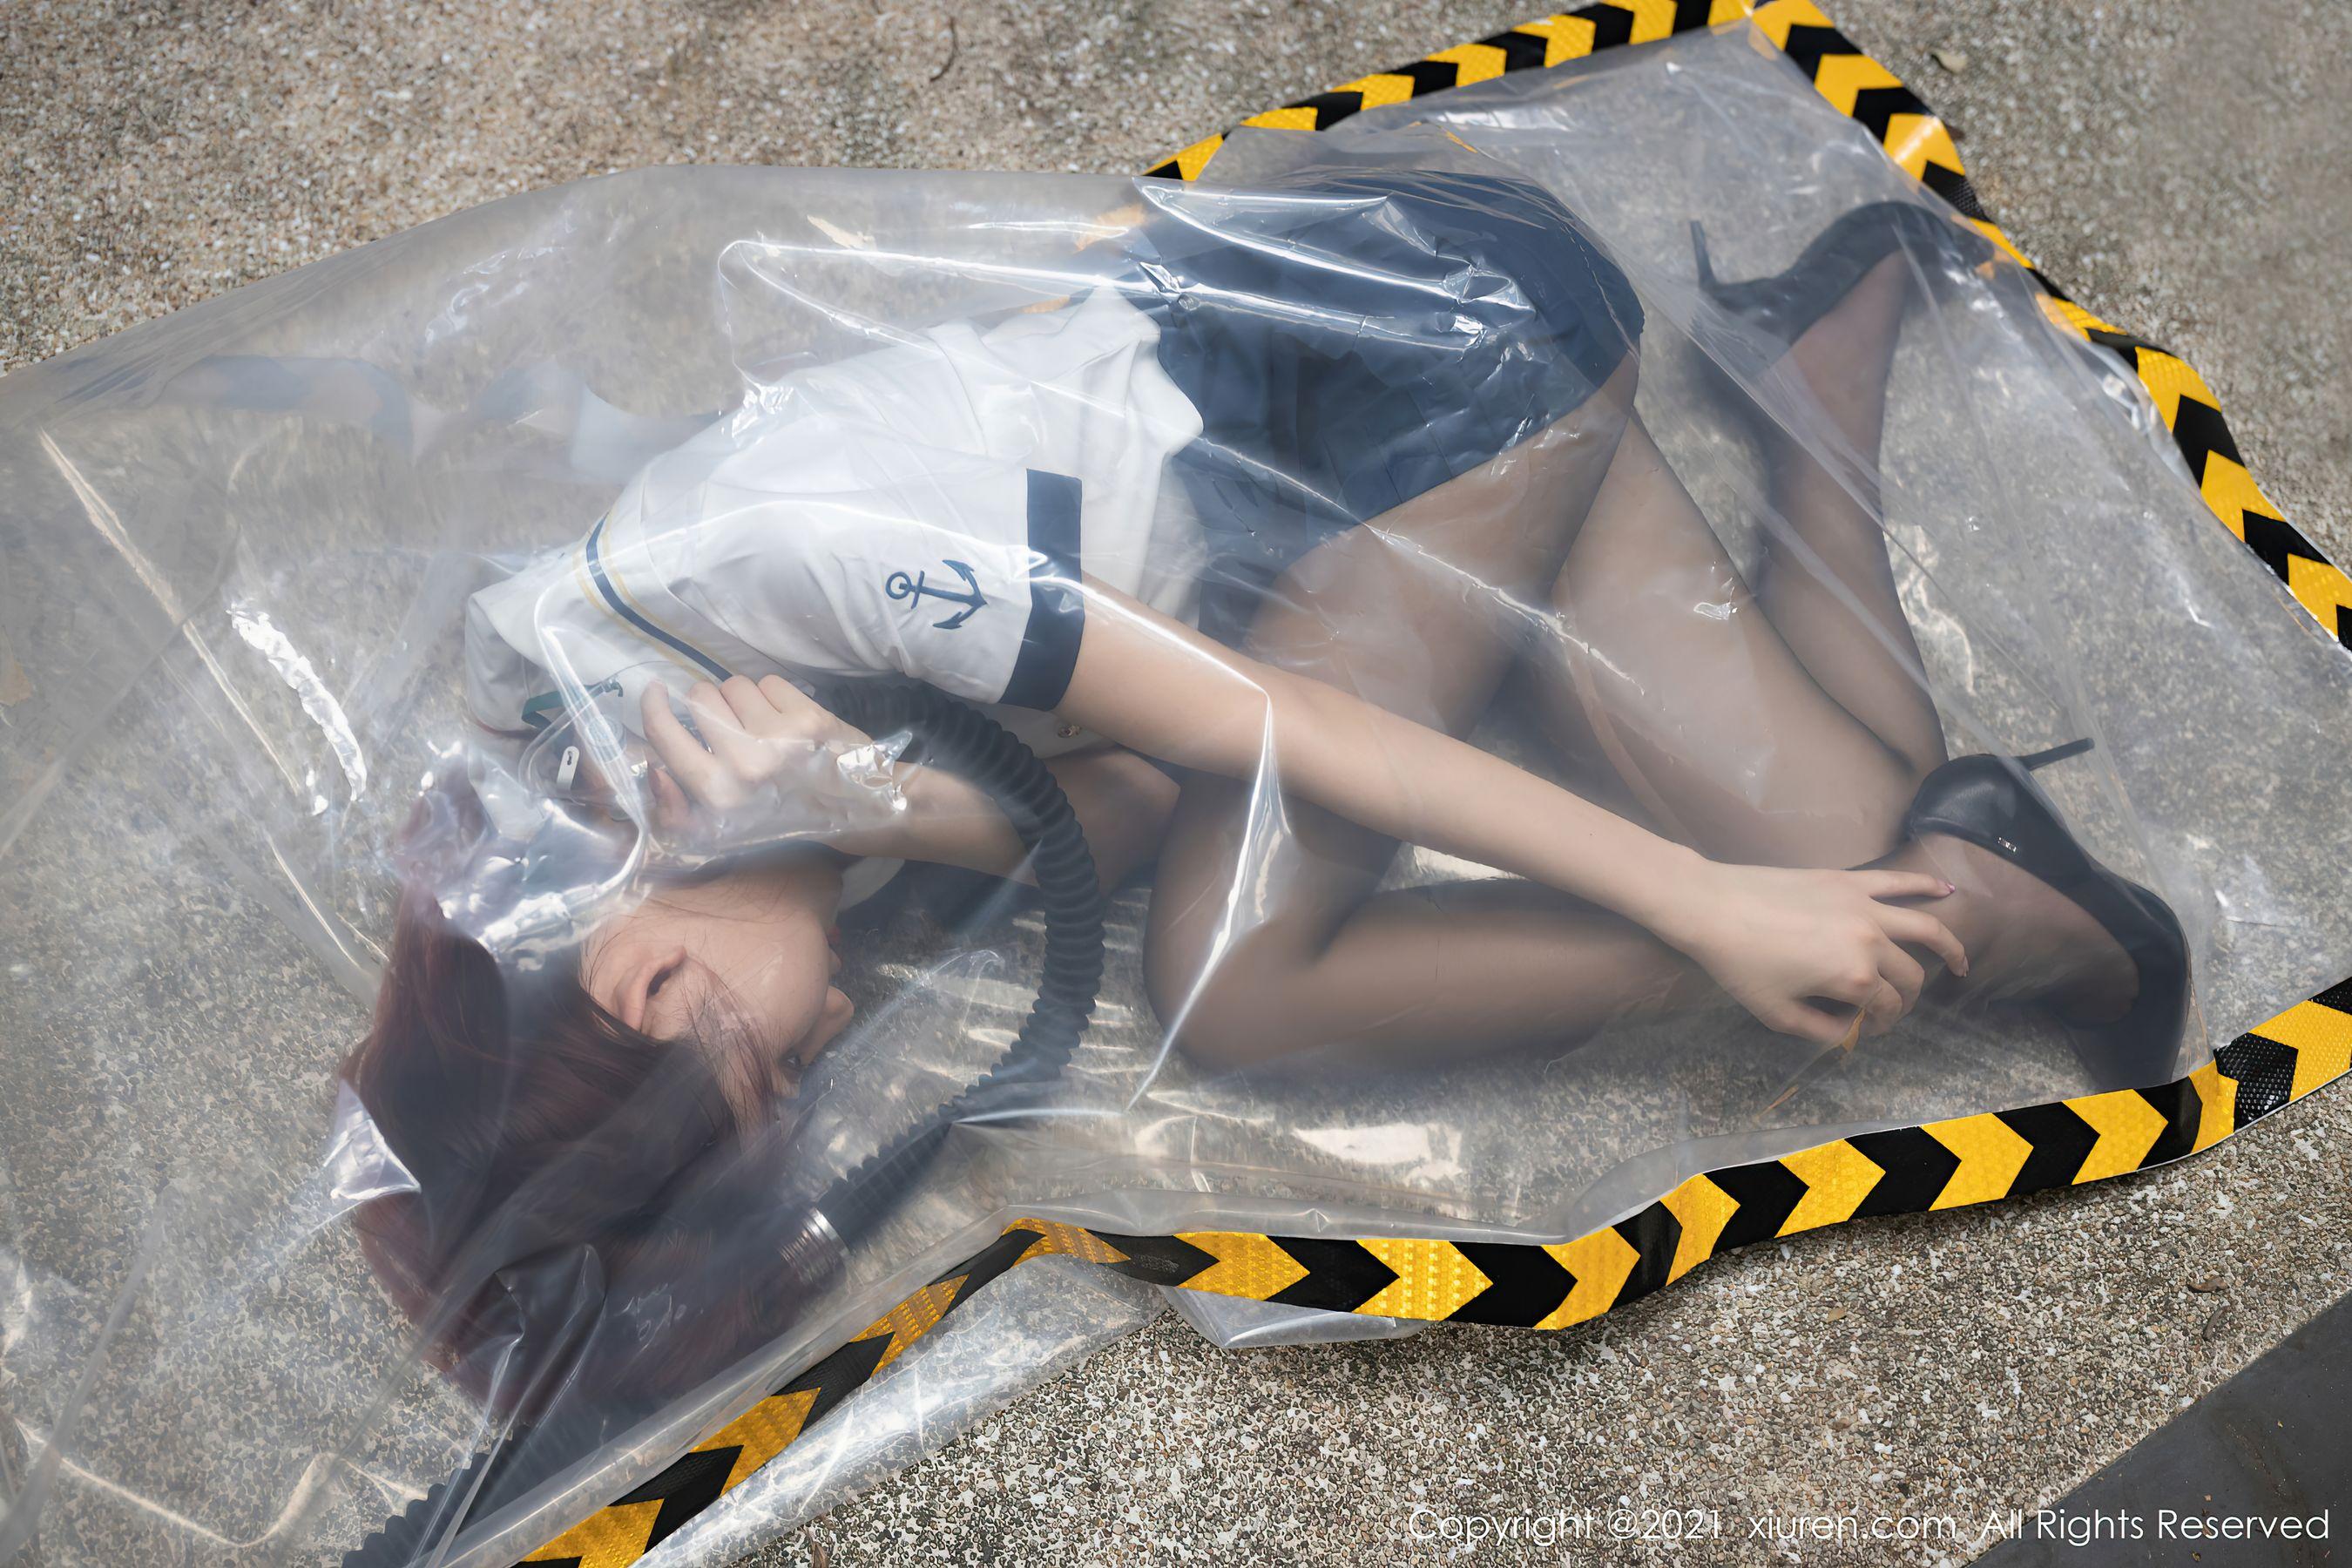 VOL.1833 [秀人网]人体艺术大尺度丝袜人体:阿朱(就是阿朱啊)超高清写真套图(64P)